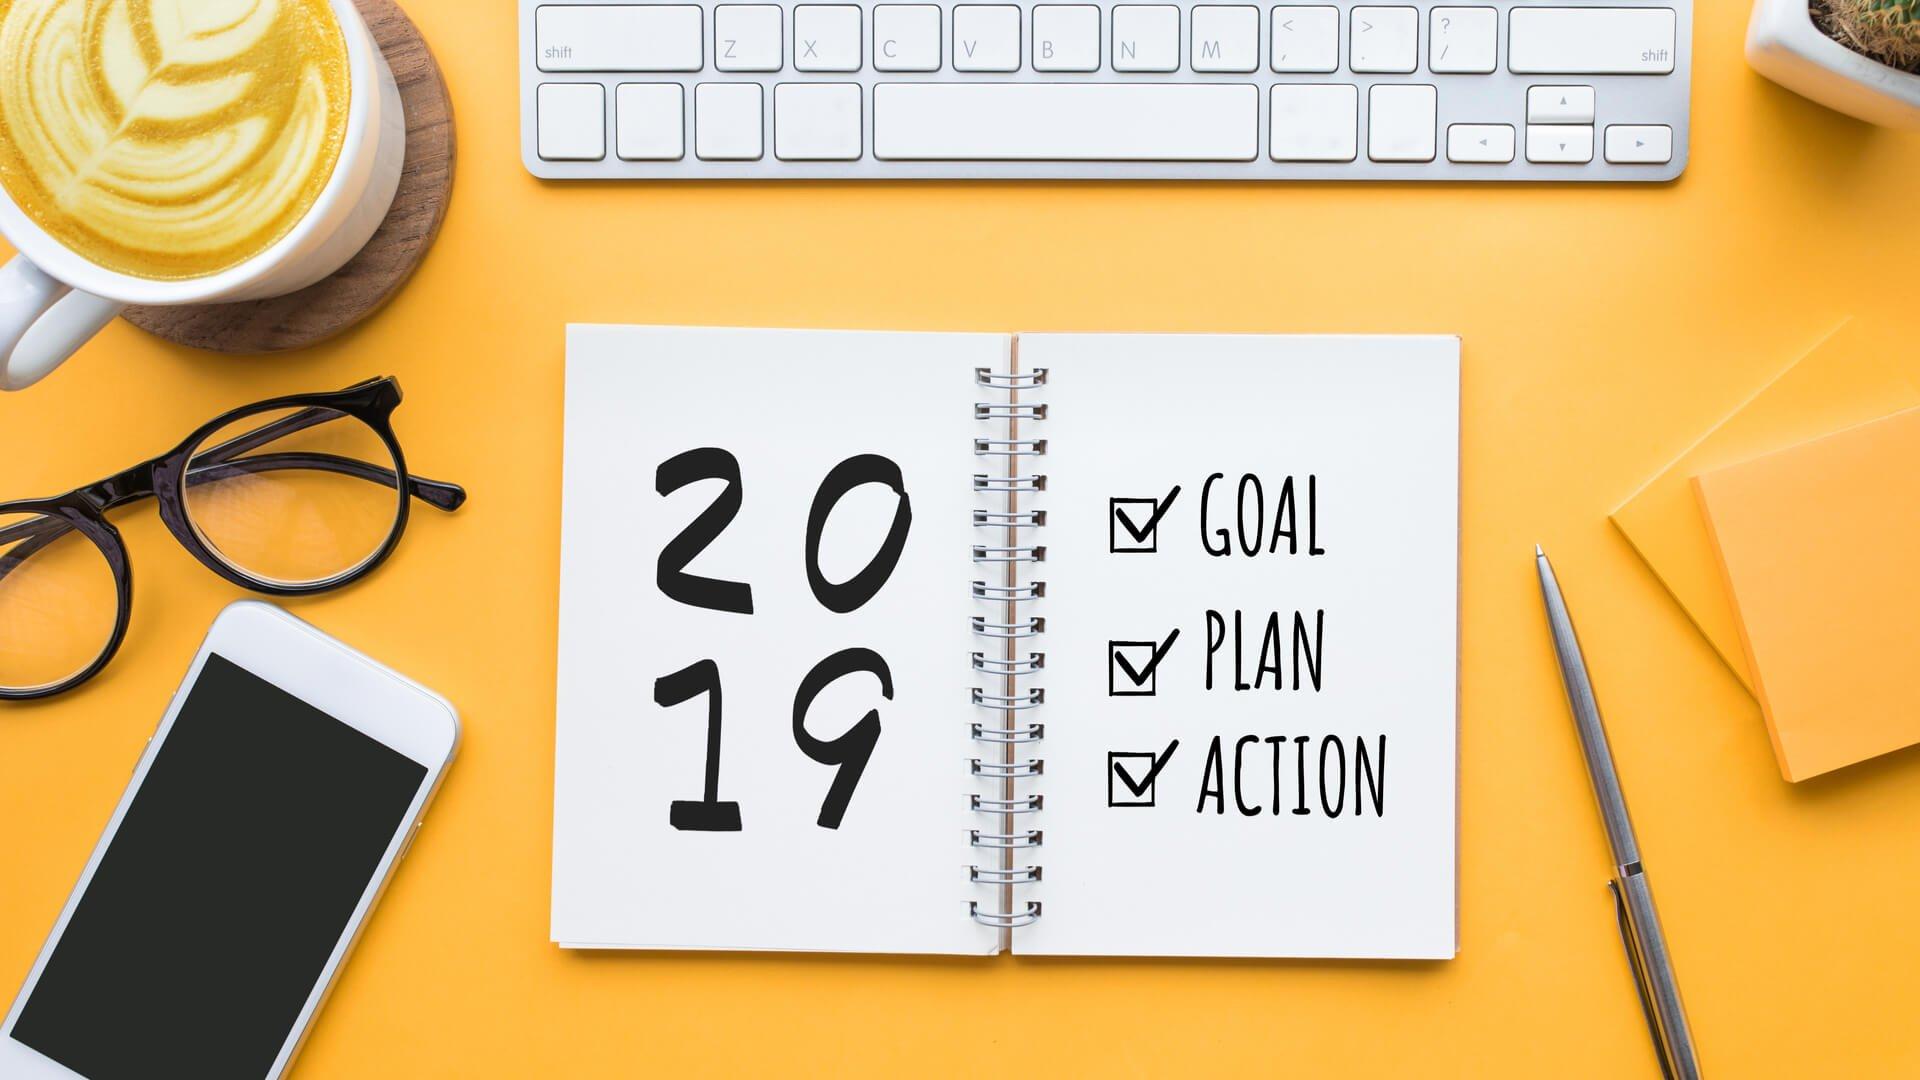 Anul nou vine cu optimism 2